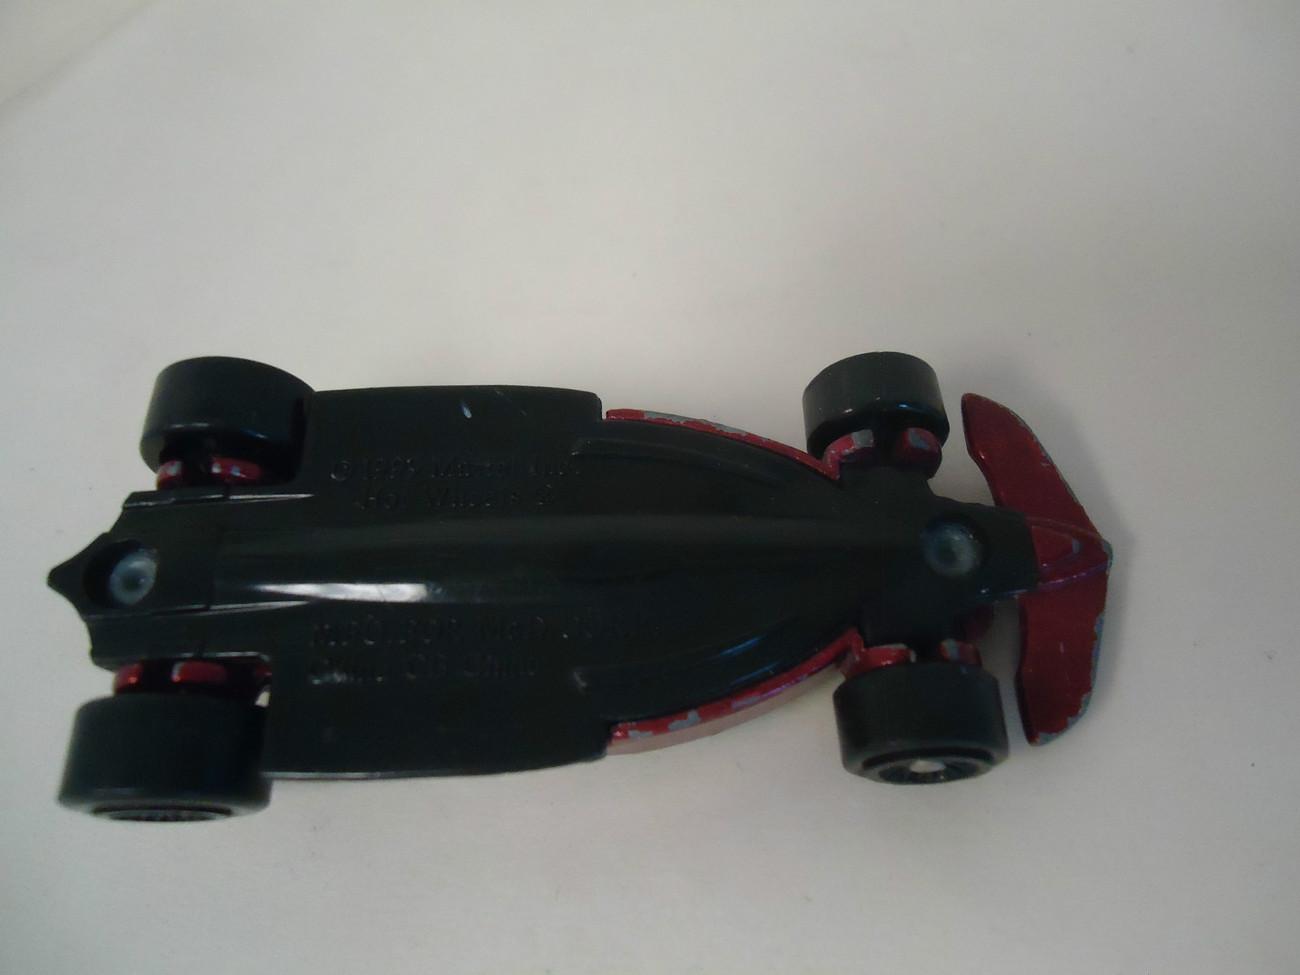 Mattel Hot Wheels  1999 Diecast Race Car for McDonalds